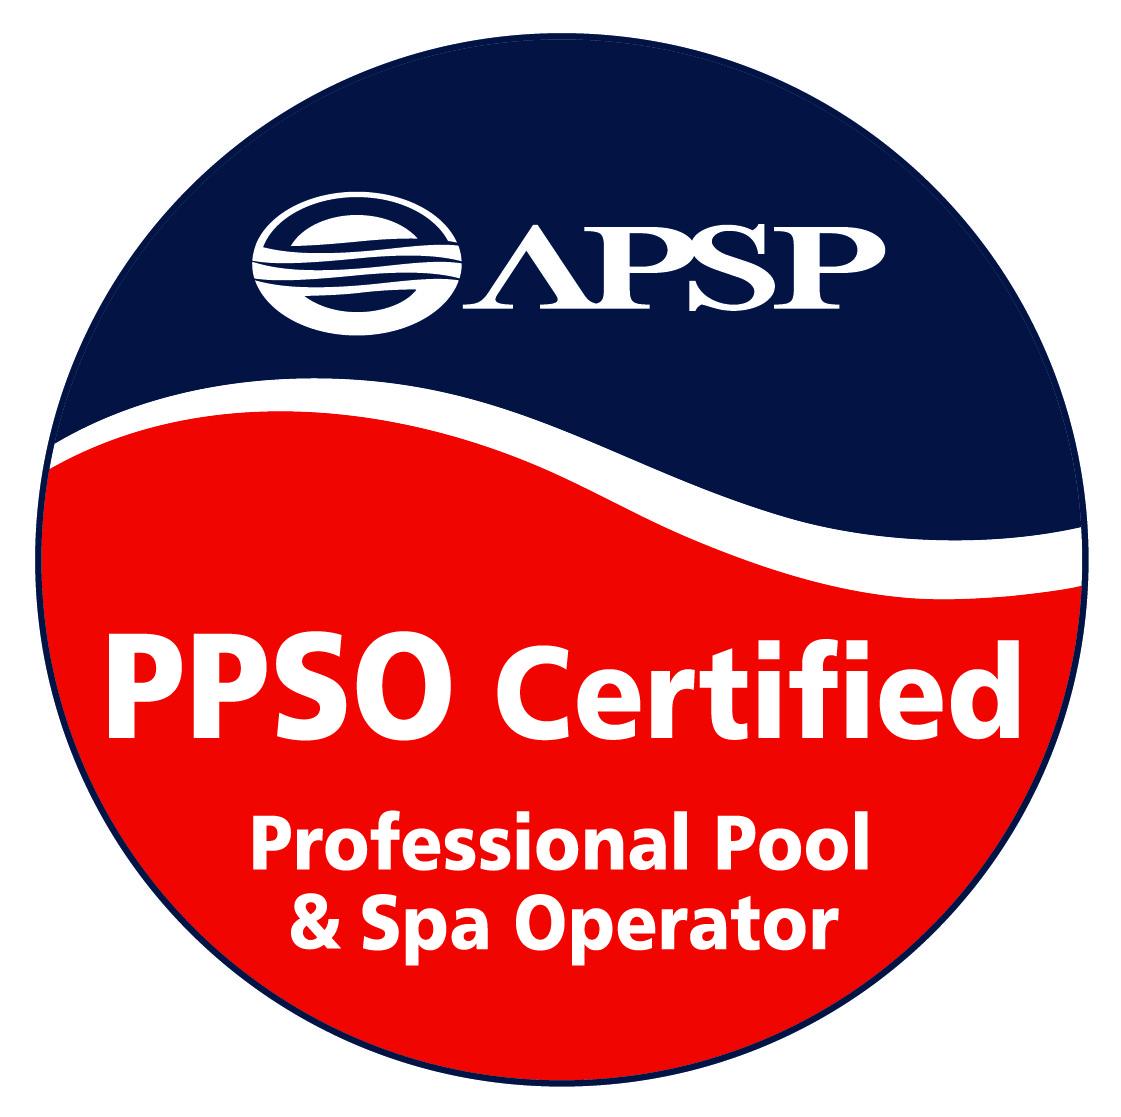 ppso-circle-logo